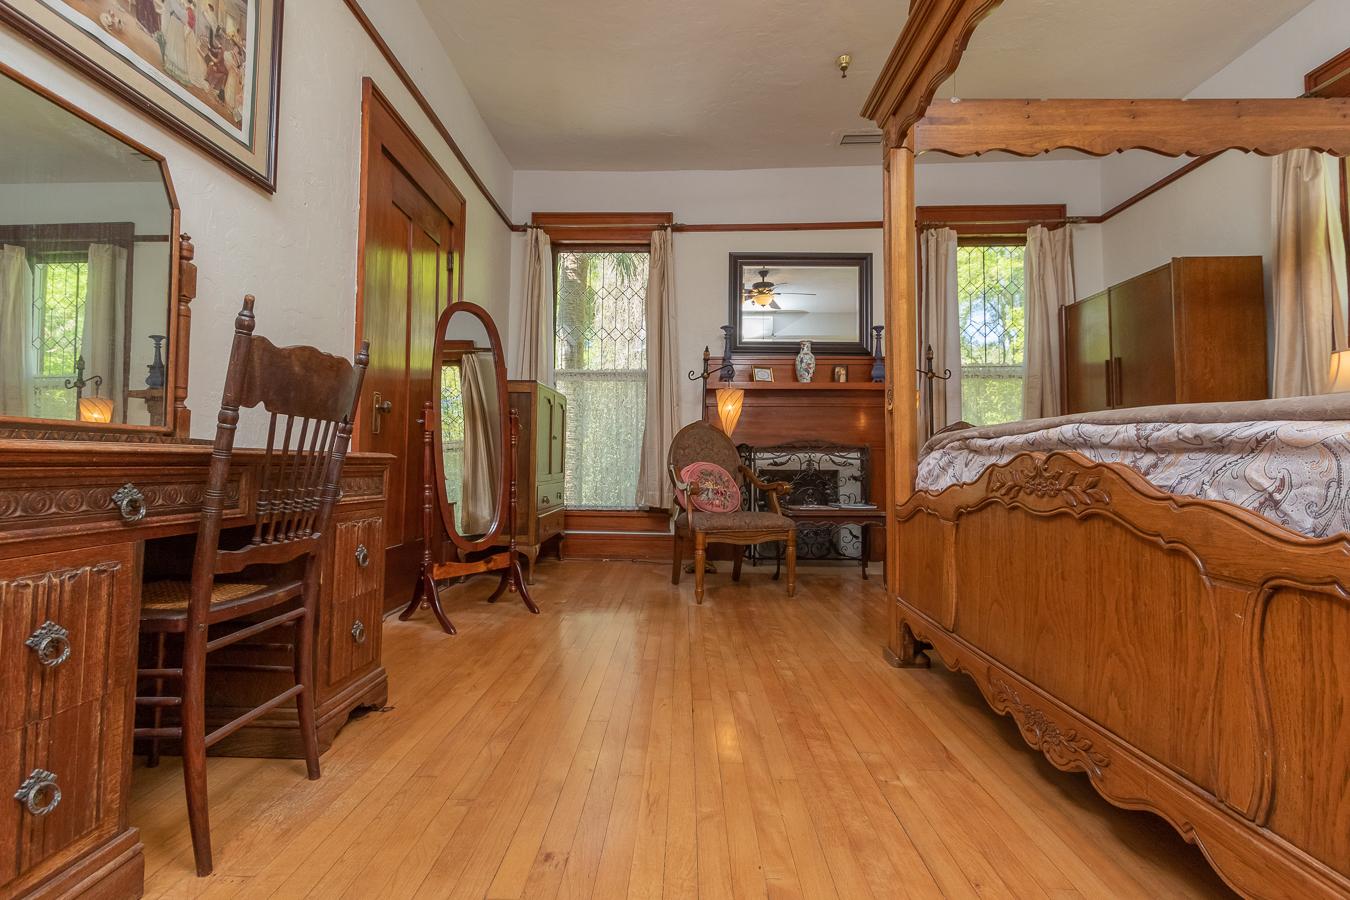 Magnolia Room | $190.80*